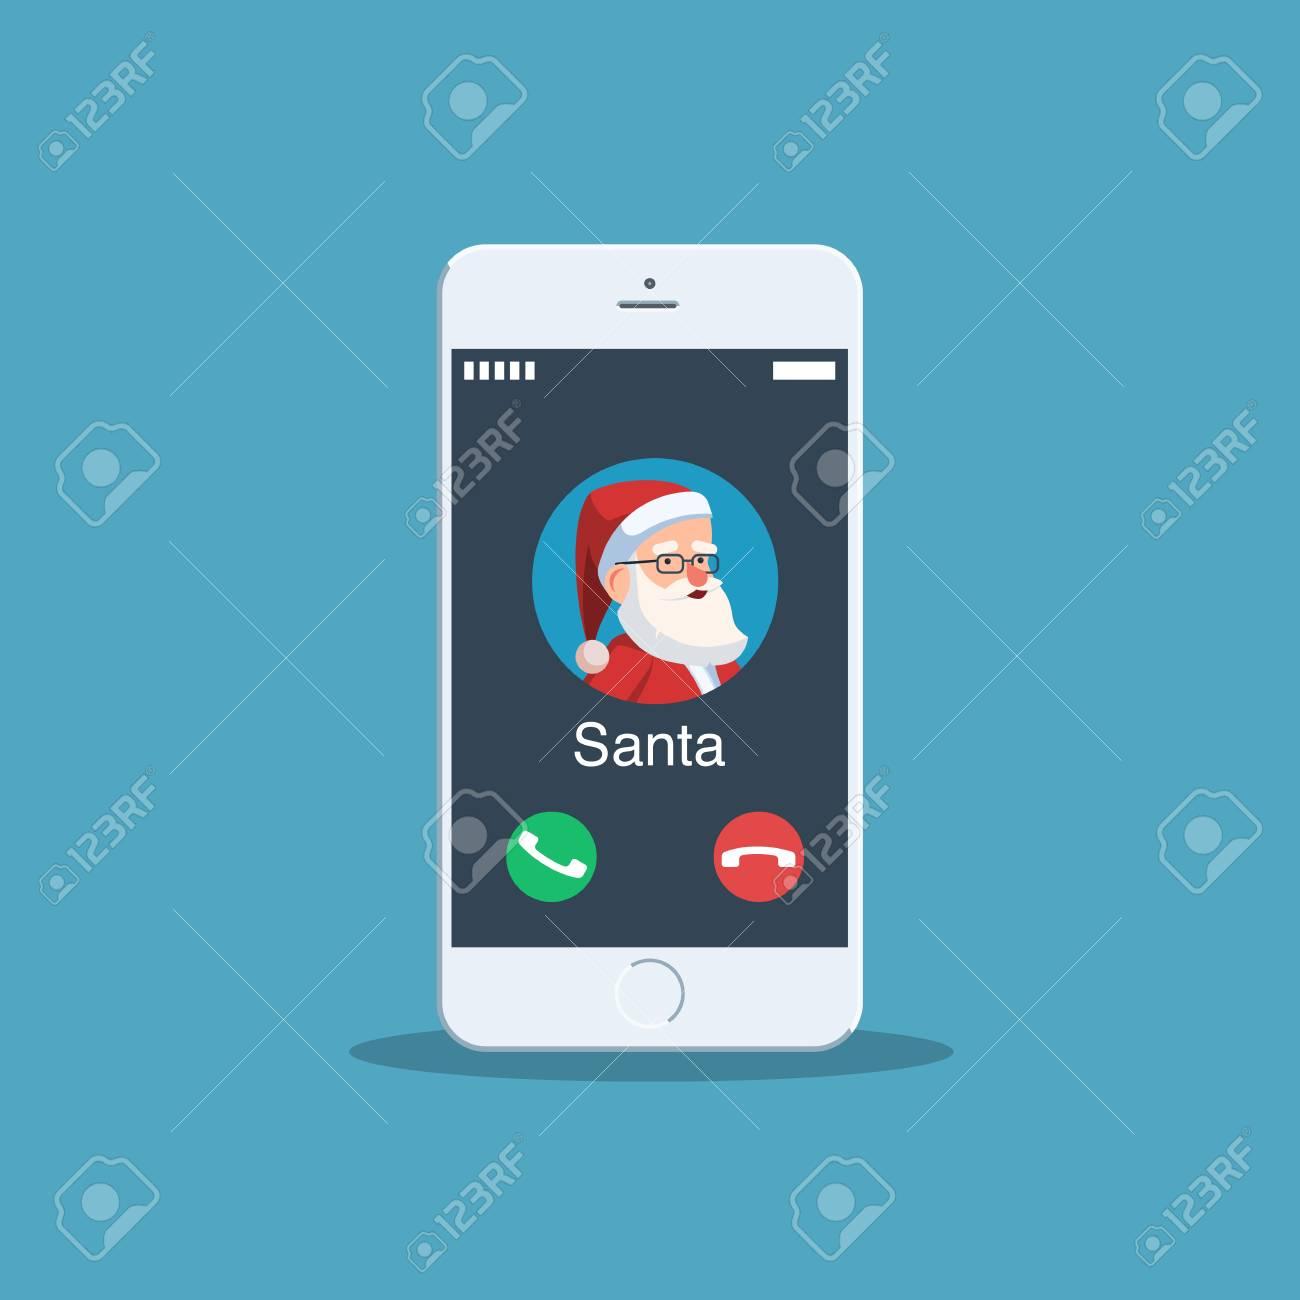 Christmas Call From Santa Claus Avatar Santa On Your Phone Screen